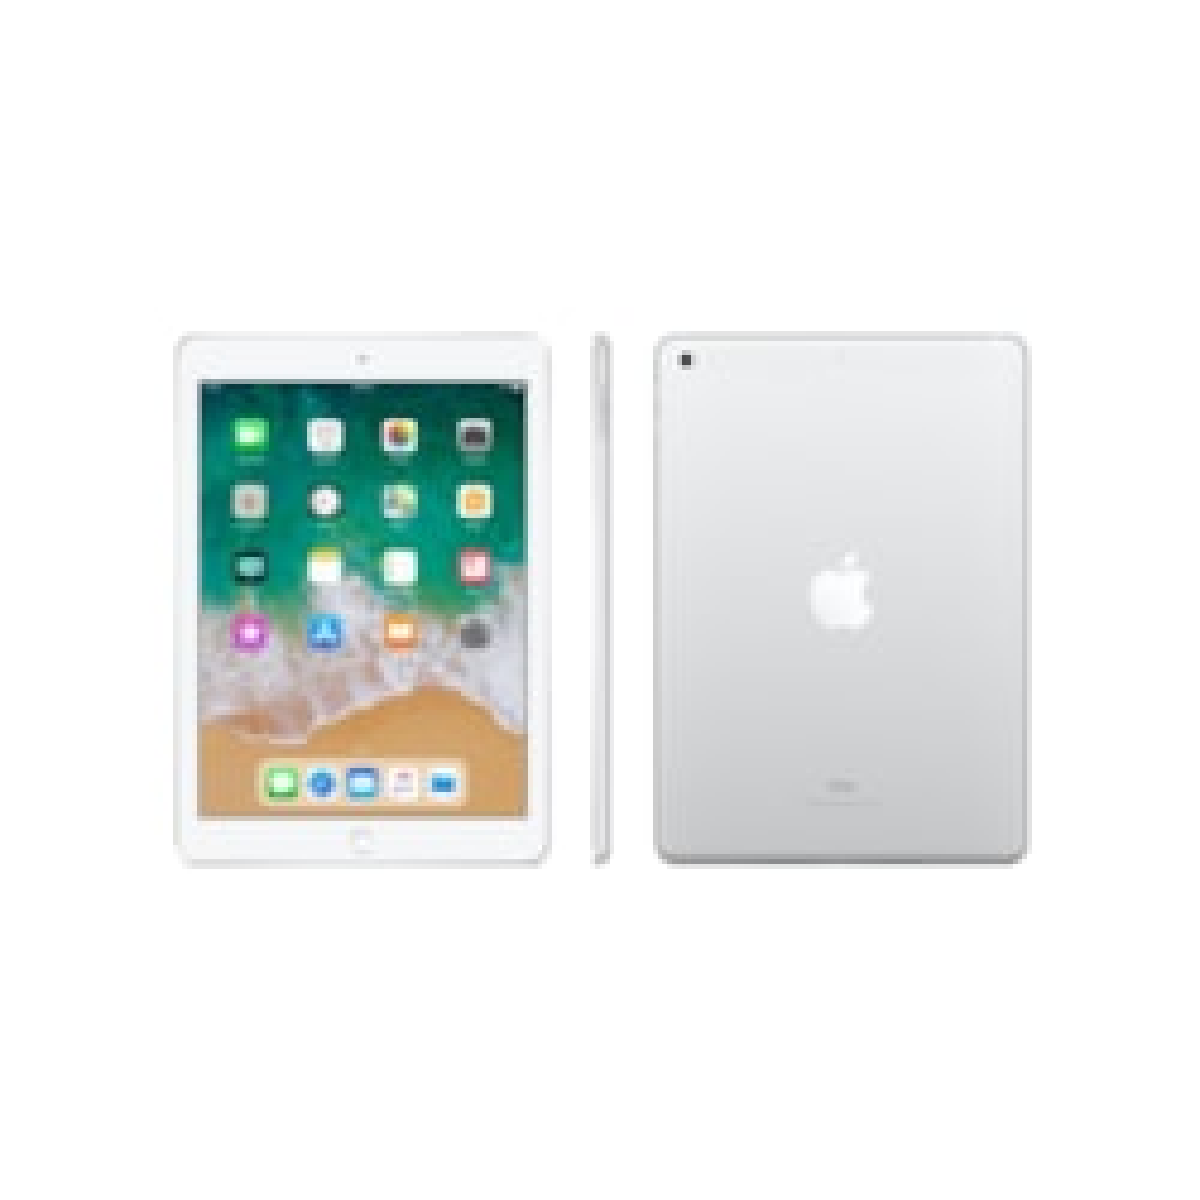 Apple iPad 9.7' 32GB Silver 4GX Tablet G6